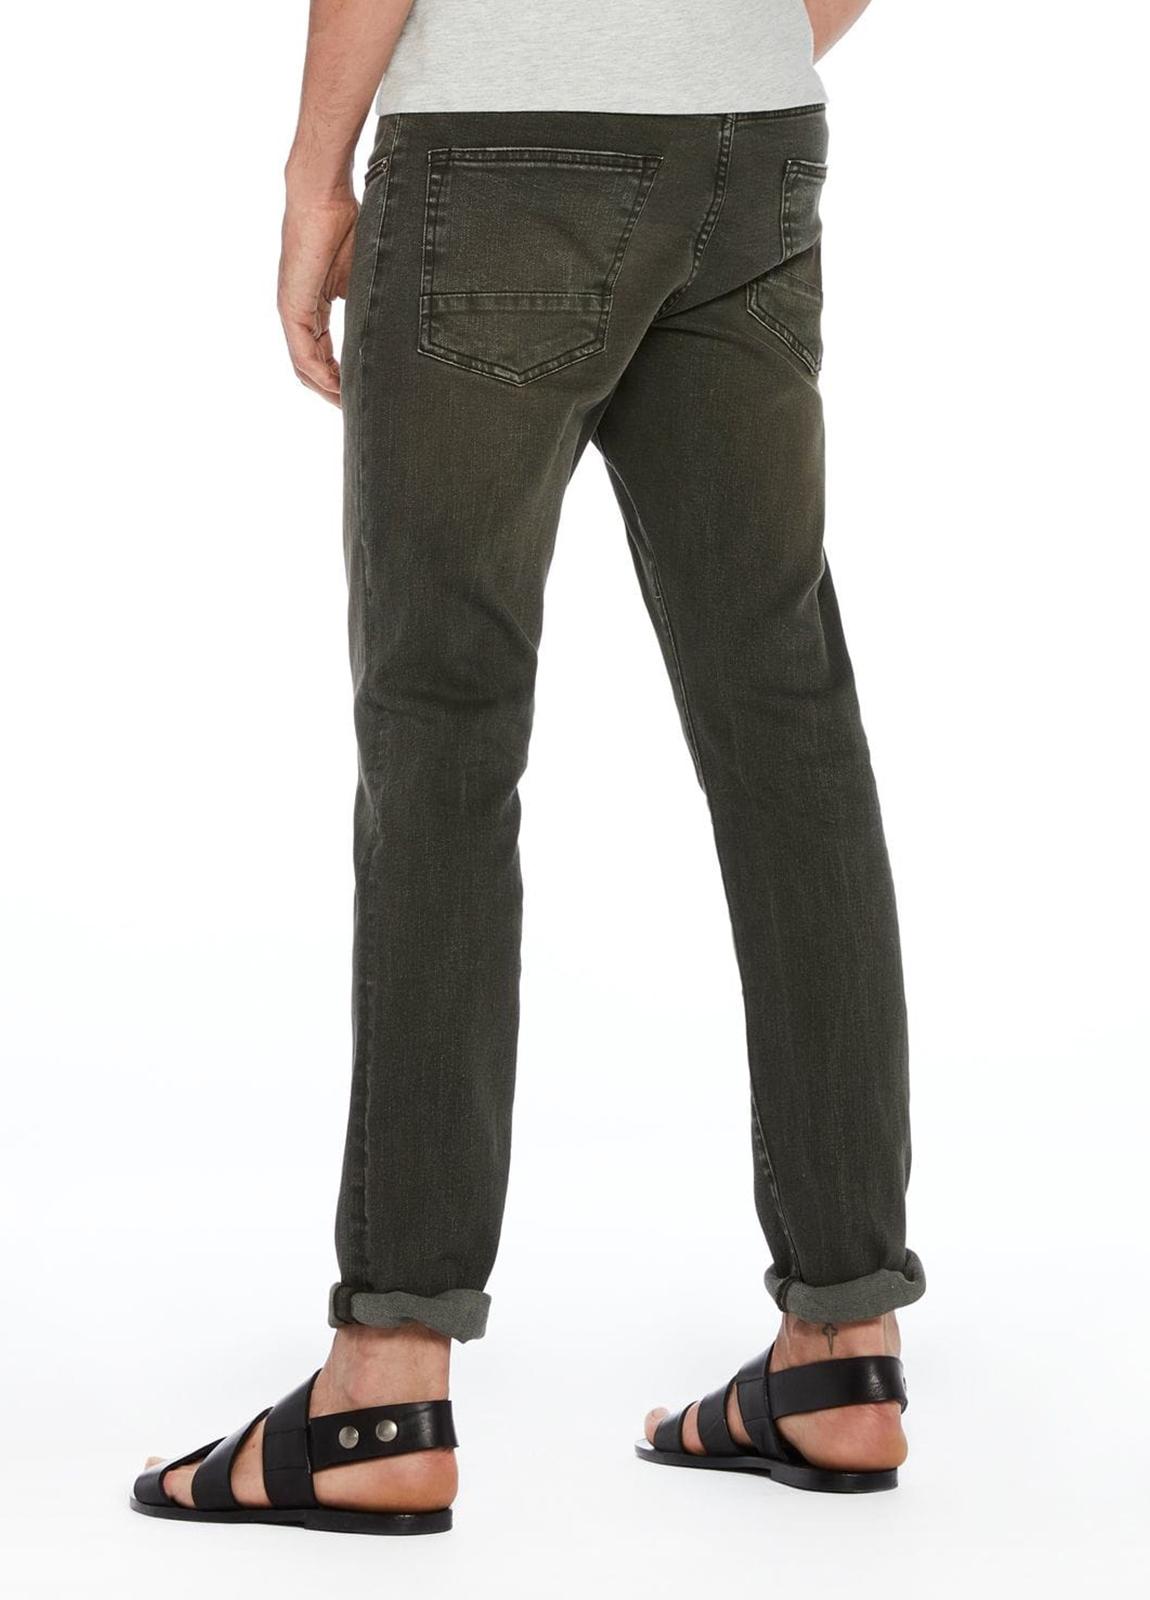 Pantalón 5 bolsillos regular slim fit modelo RALSTON denim elástico teñido en prenda color verde oscuro. 78% Algodón 21% Poliéster 1% Elastano. - Ítem1